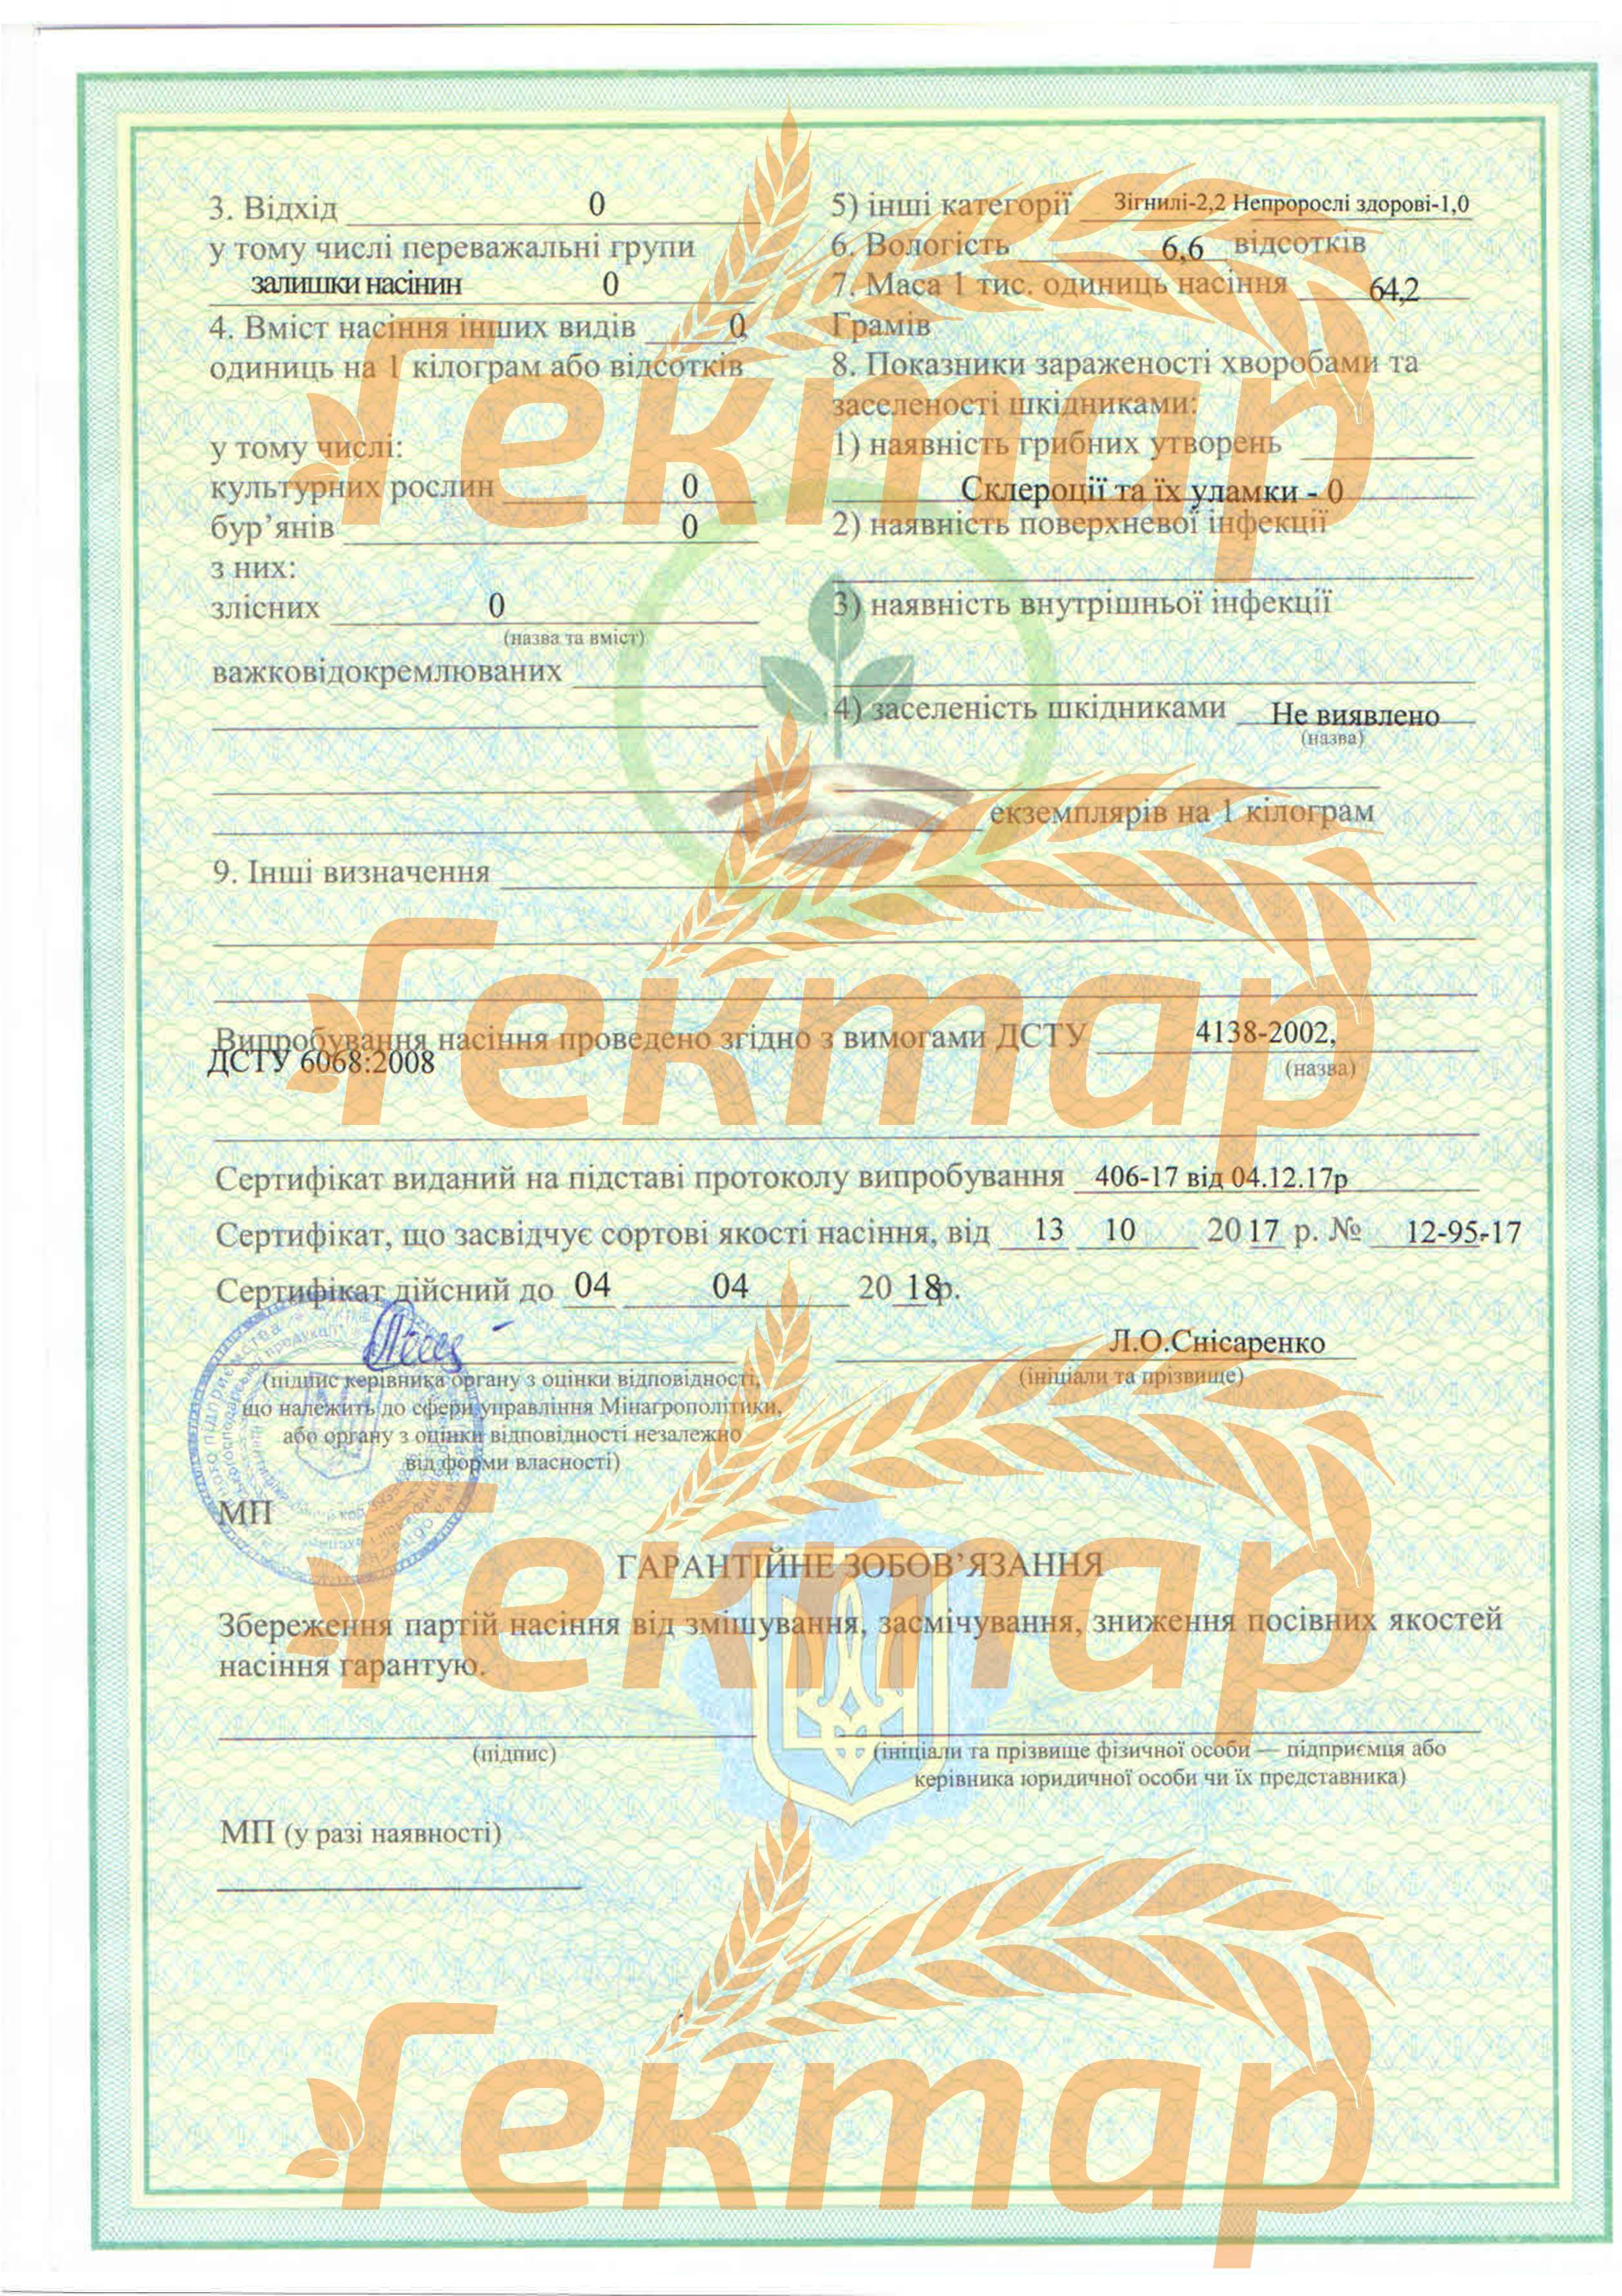 https://hectare.ua/upload/5aaf90c741df0.jpg